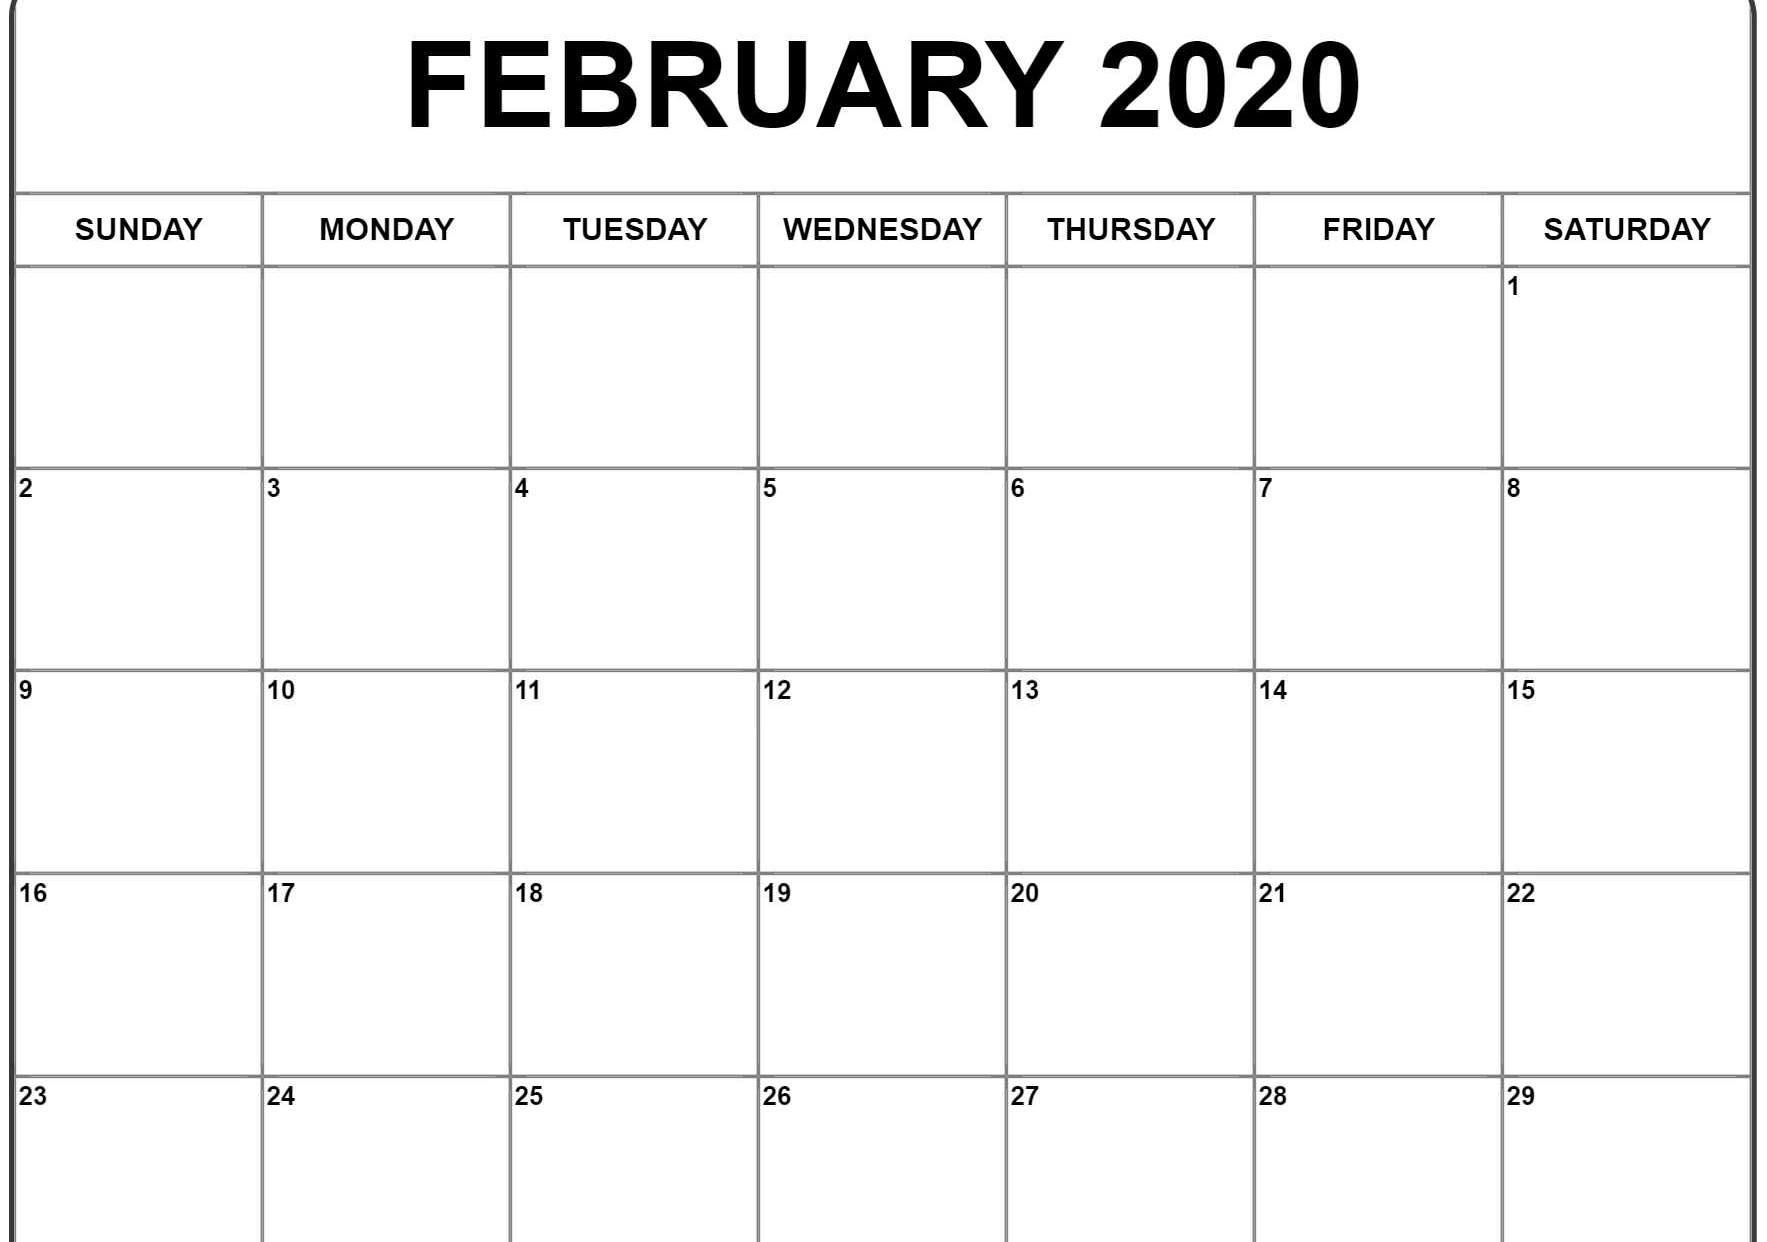 February 2020 Calendar Excel | February Calendar, Excel in Feb 2020 Calendar